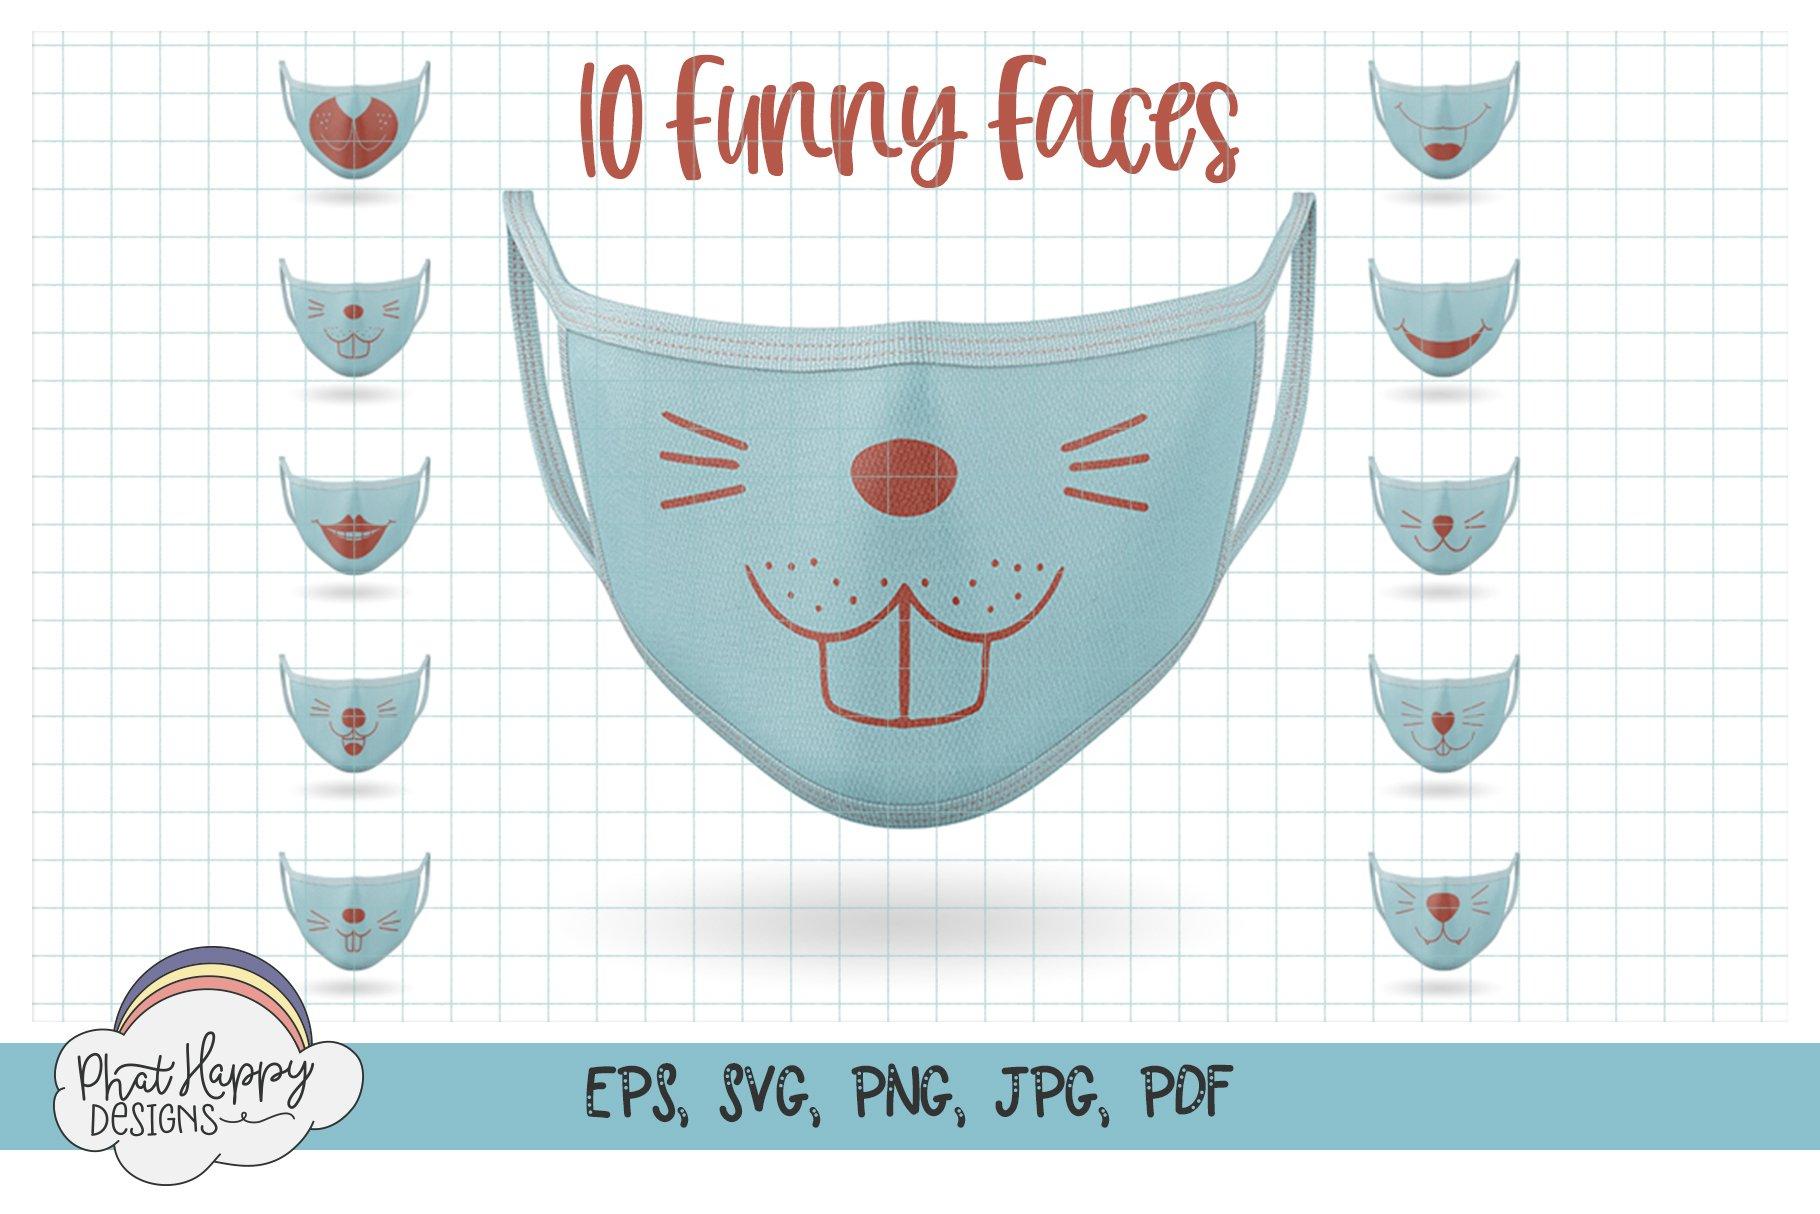 Funny Faces for Masks 40 Design Bundle - SVG Cut Files example image 2